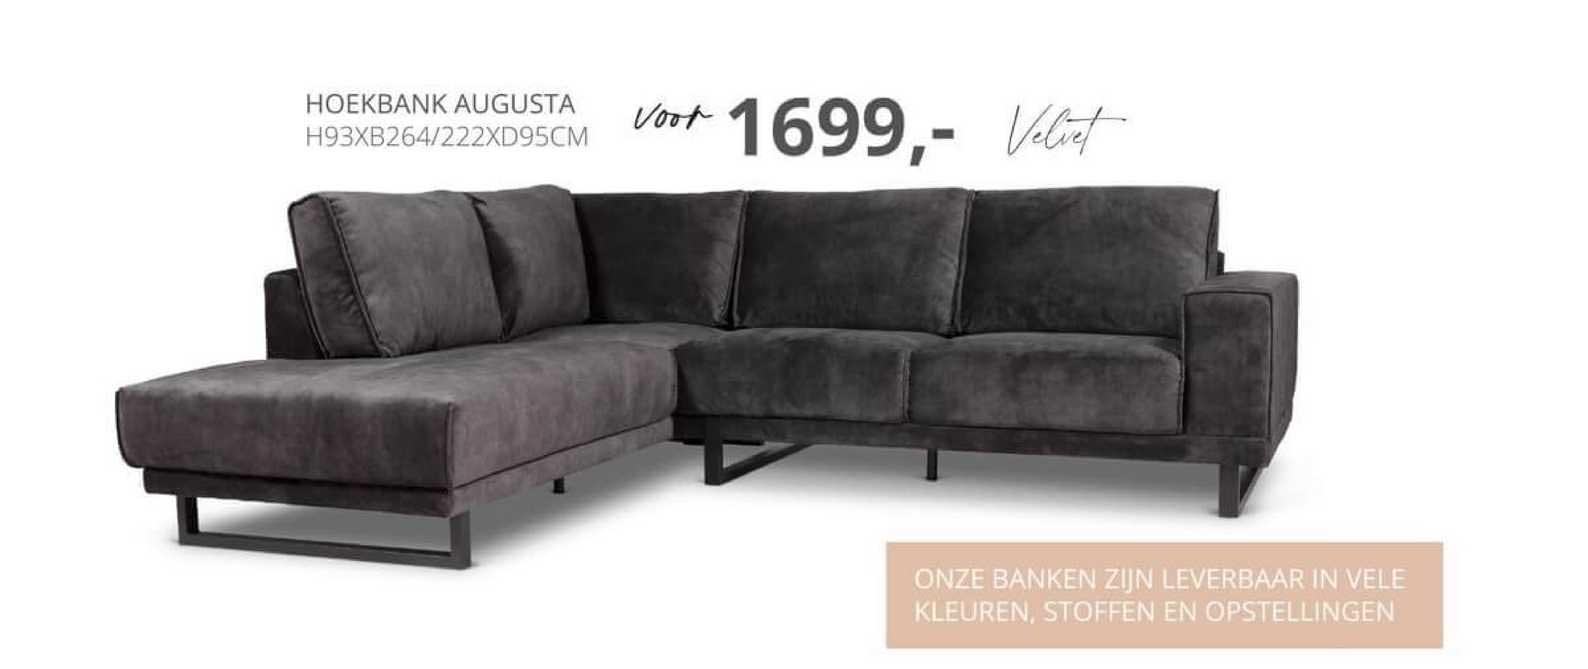 De Bommel Meubelen Hoekbank Augusta H93xB264-222xD95cm